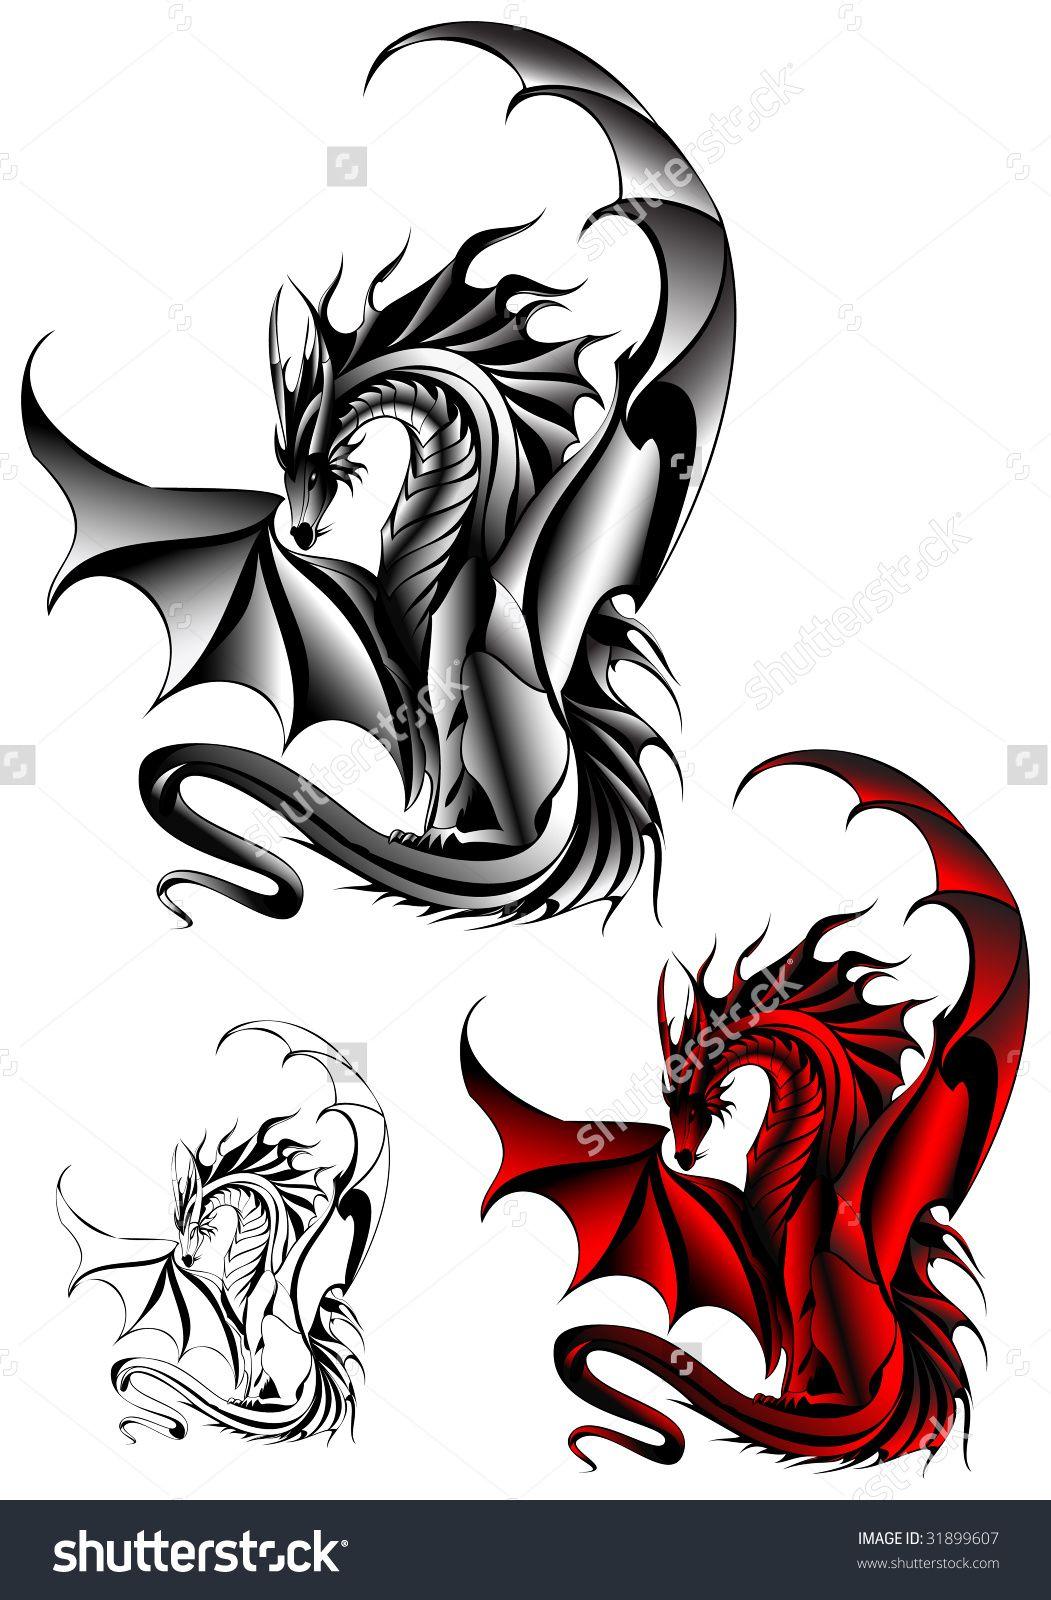 Welsh dragon tattoo designs - Tattoo Dragon Design Stock Vector Illustration 31899607 Shutterstock